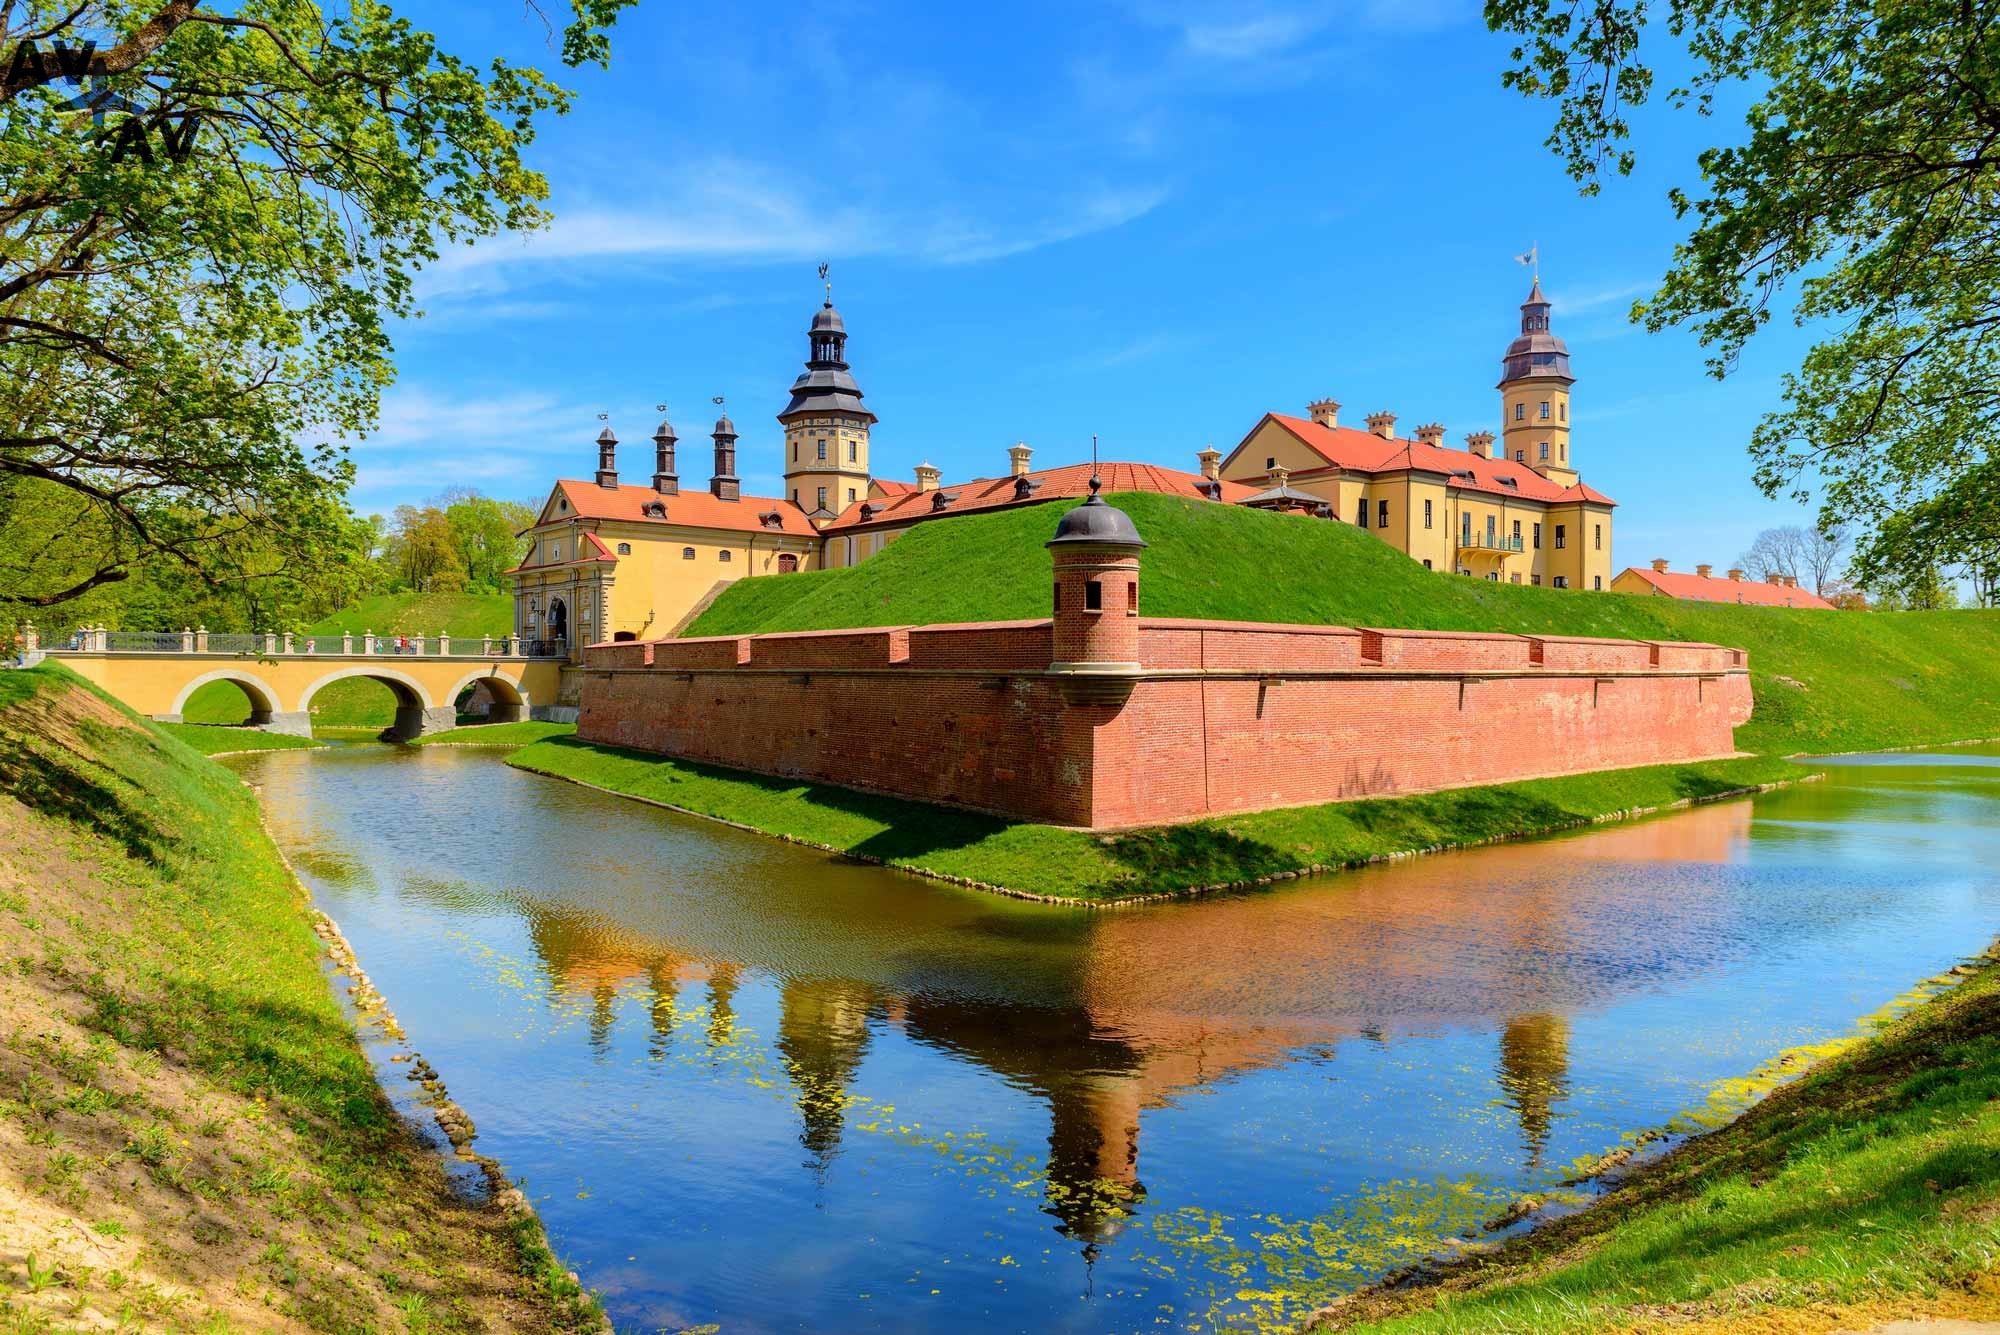 Otdyih i turizm v respublike Belarus - Отдых и туризм в республике Беларусь